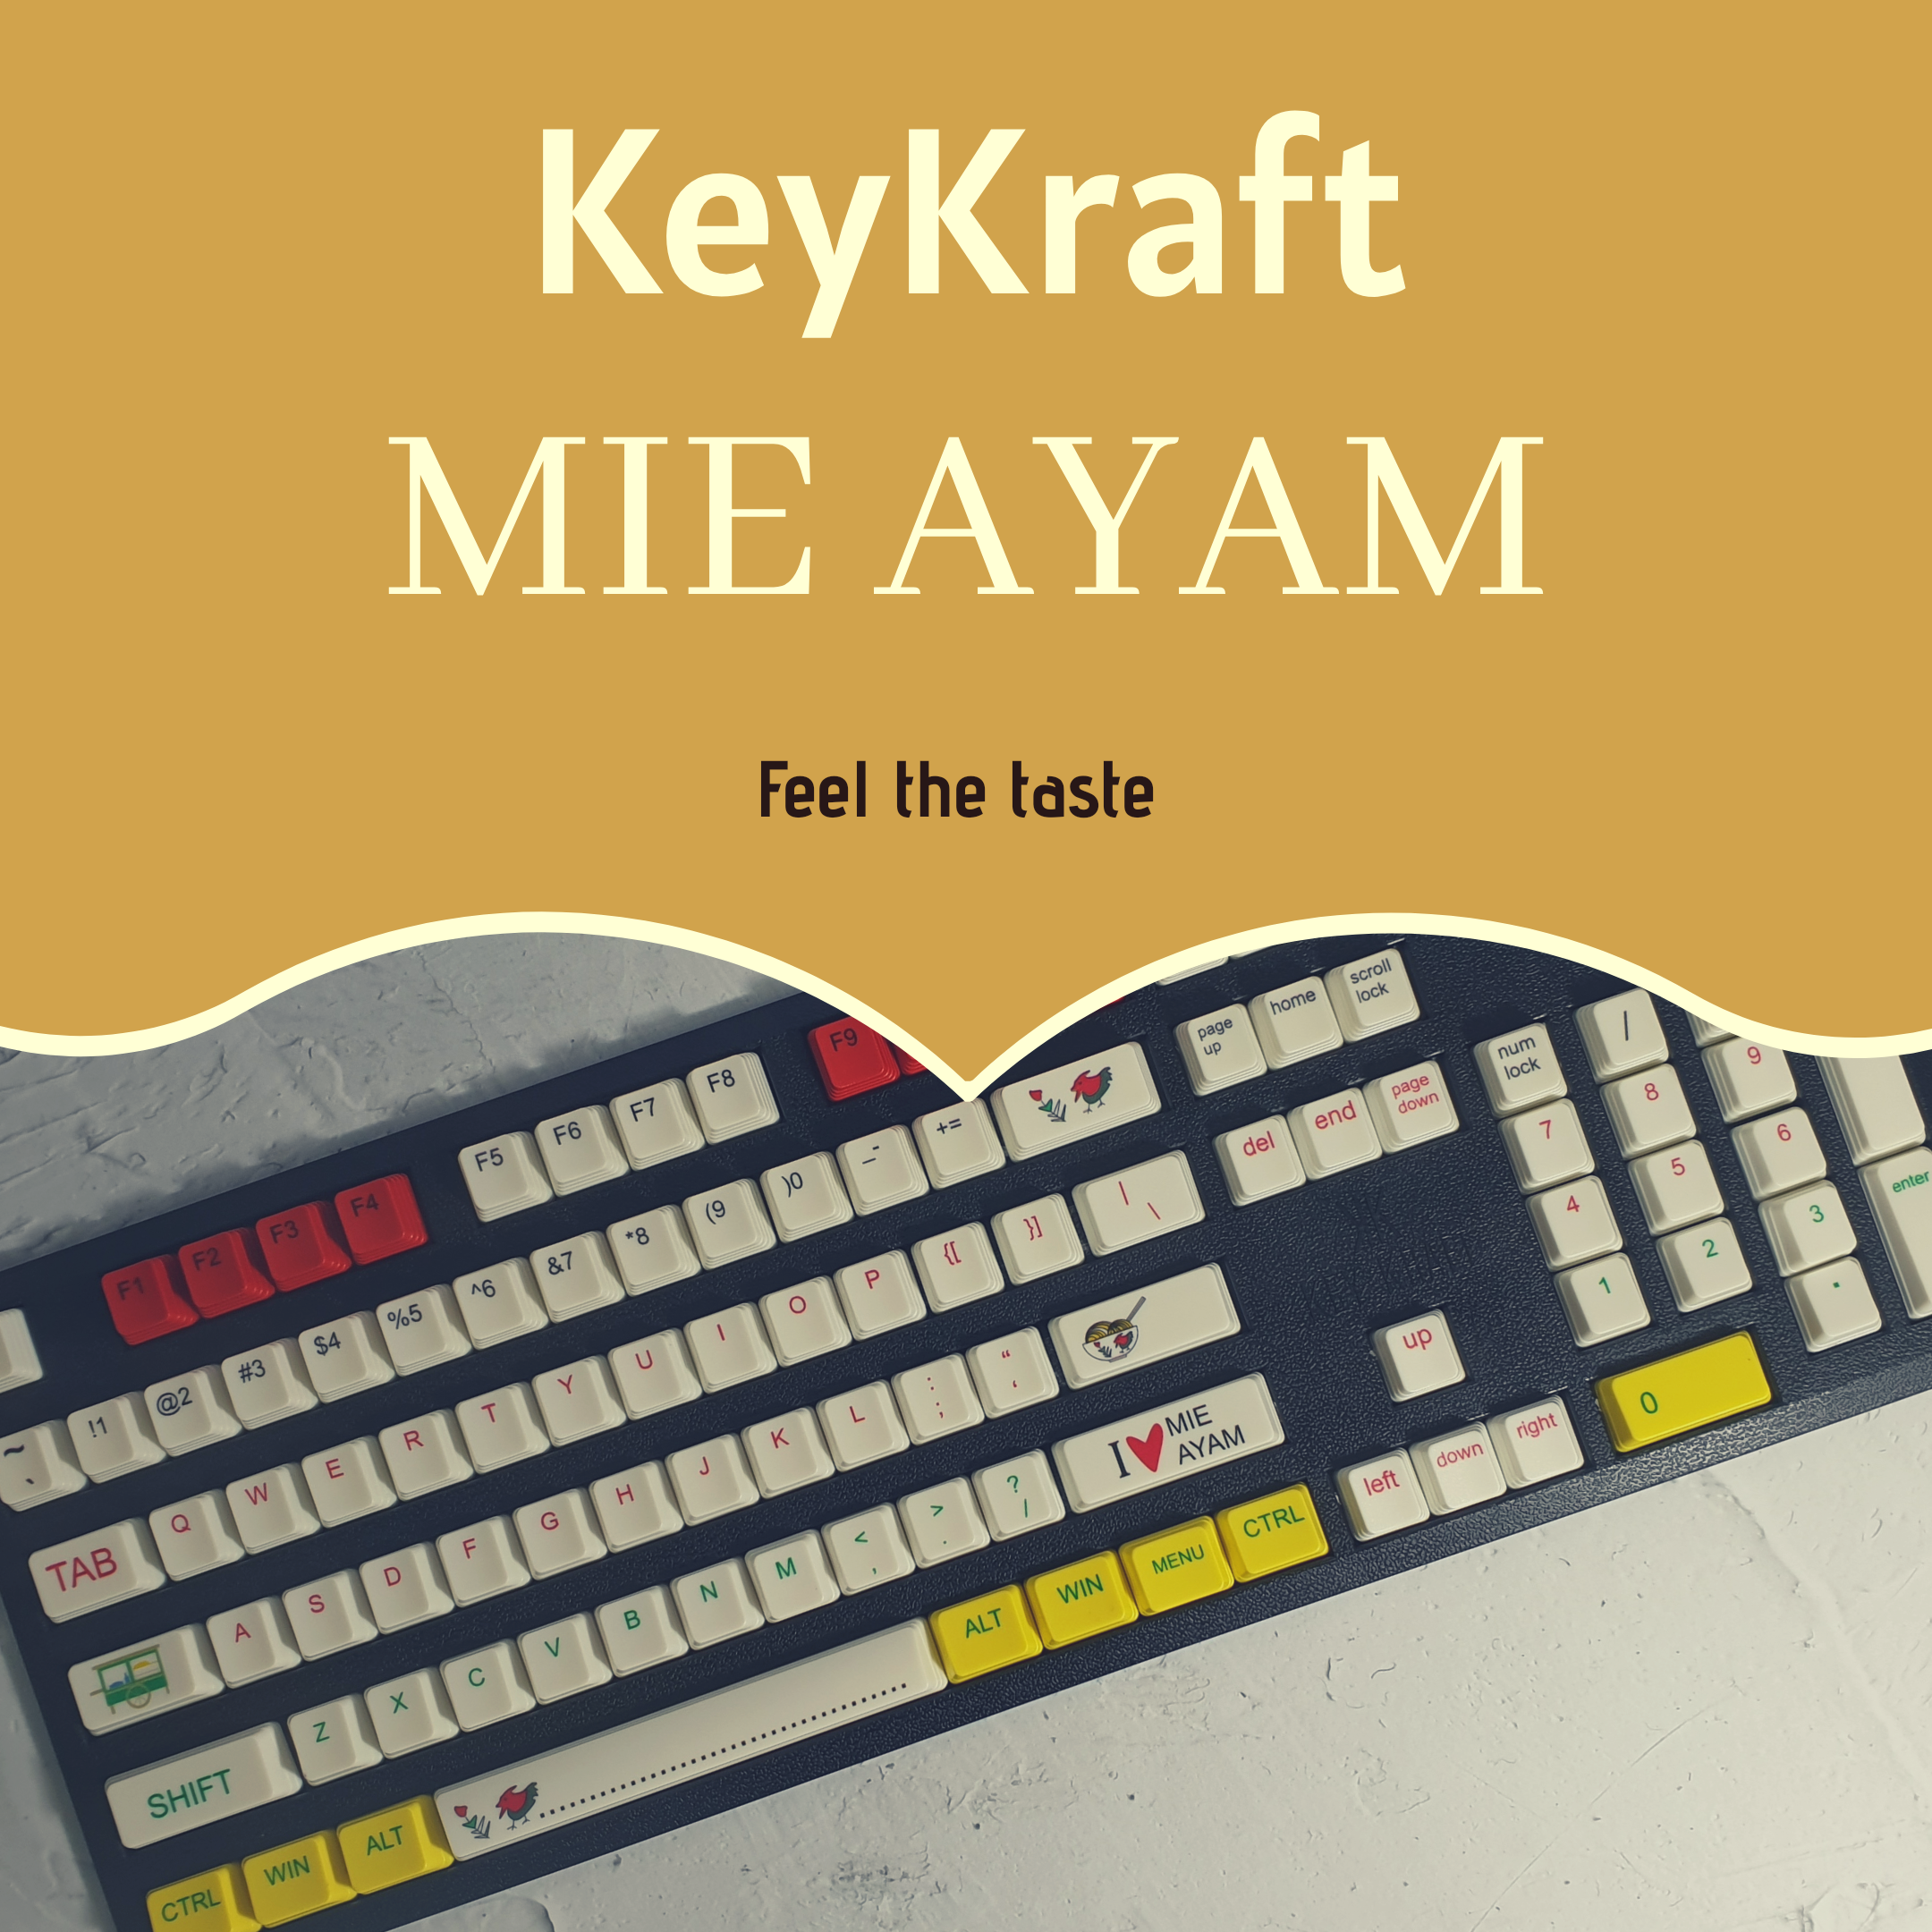 KeyKraft MIE AYAM